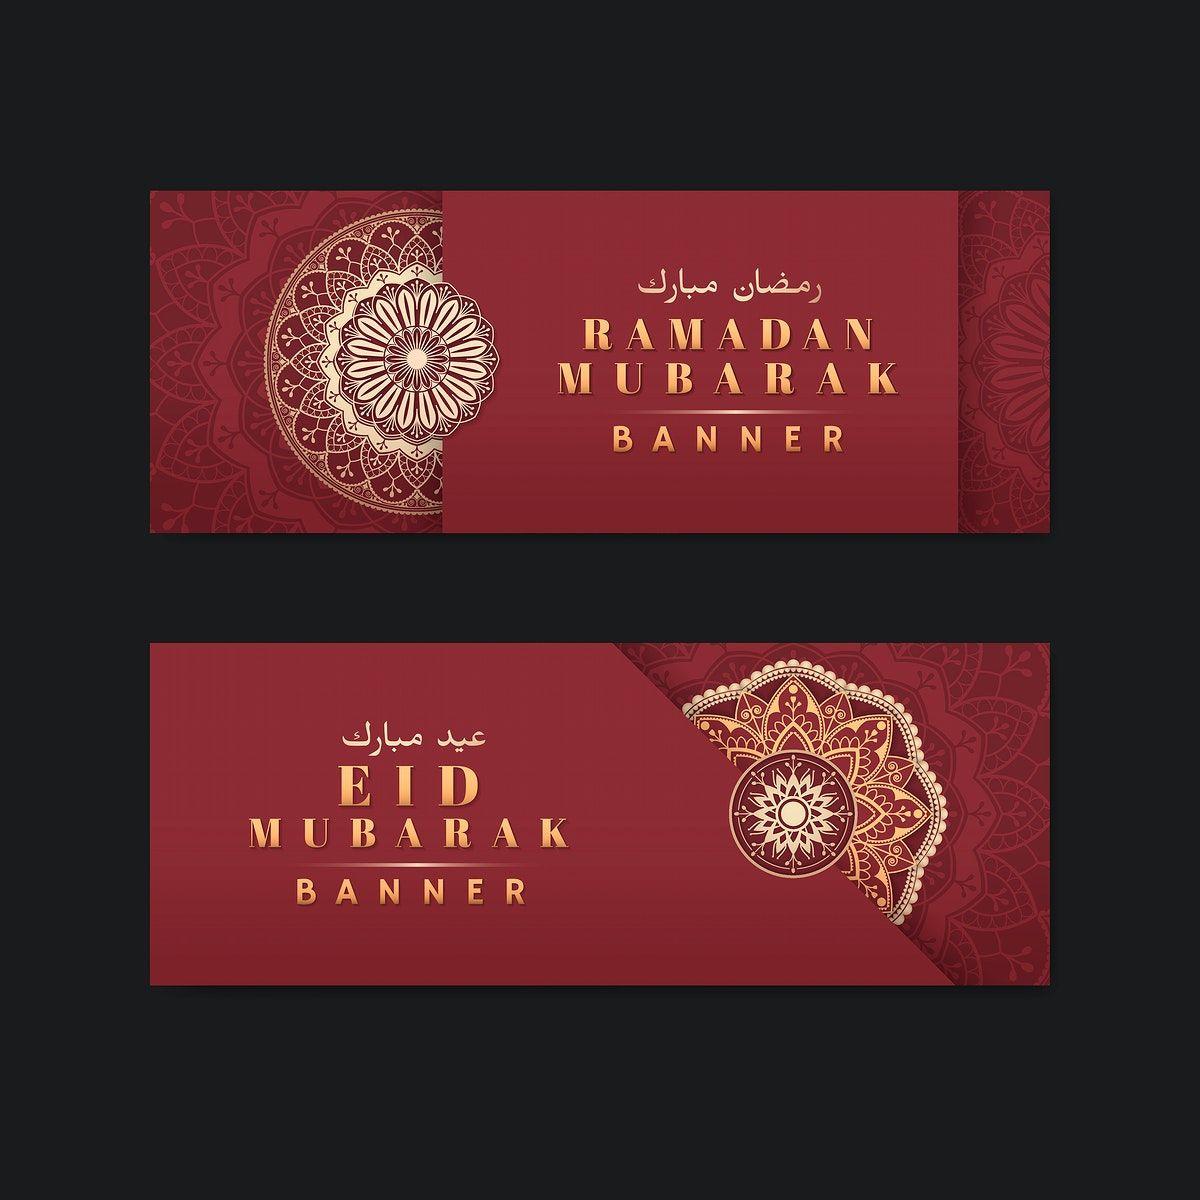 Download Premium Vector Of Red And Gold Eid Mubarak Banners Vector Set Eid Mubarak Banner Vector Eid Mubarak Banner